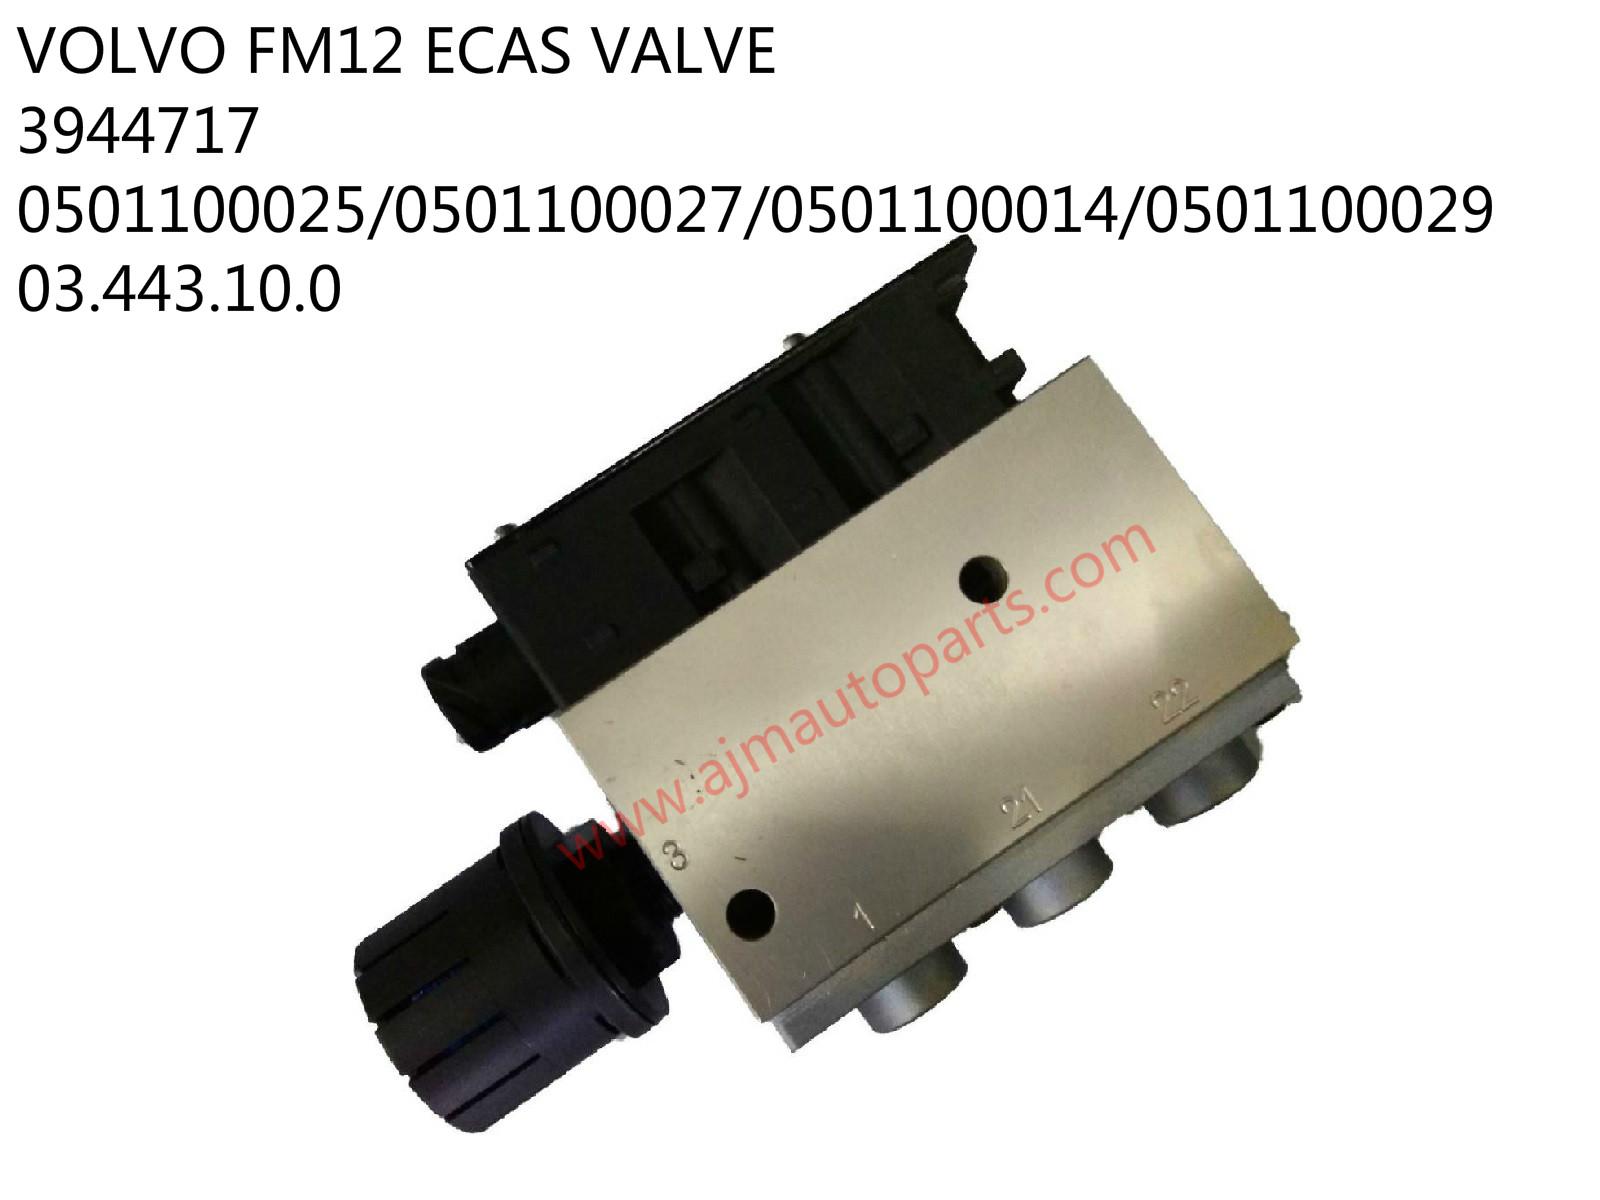 VOLVO FM12 ECAS VALVE-3944717/0501100025/0501100027/050100014